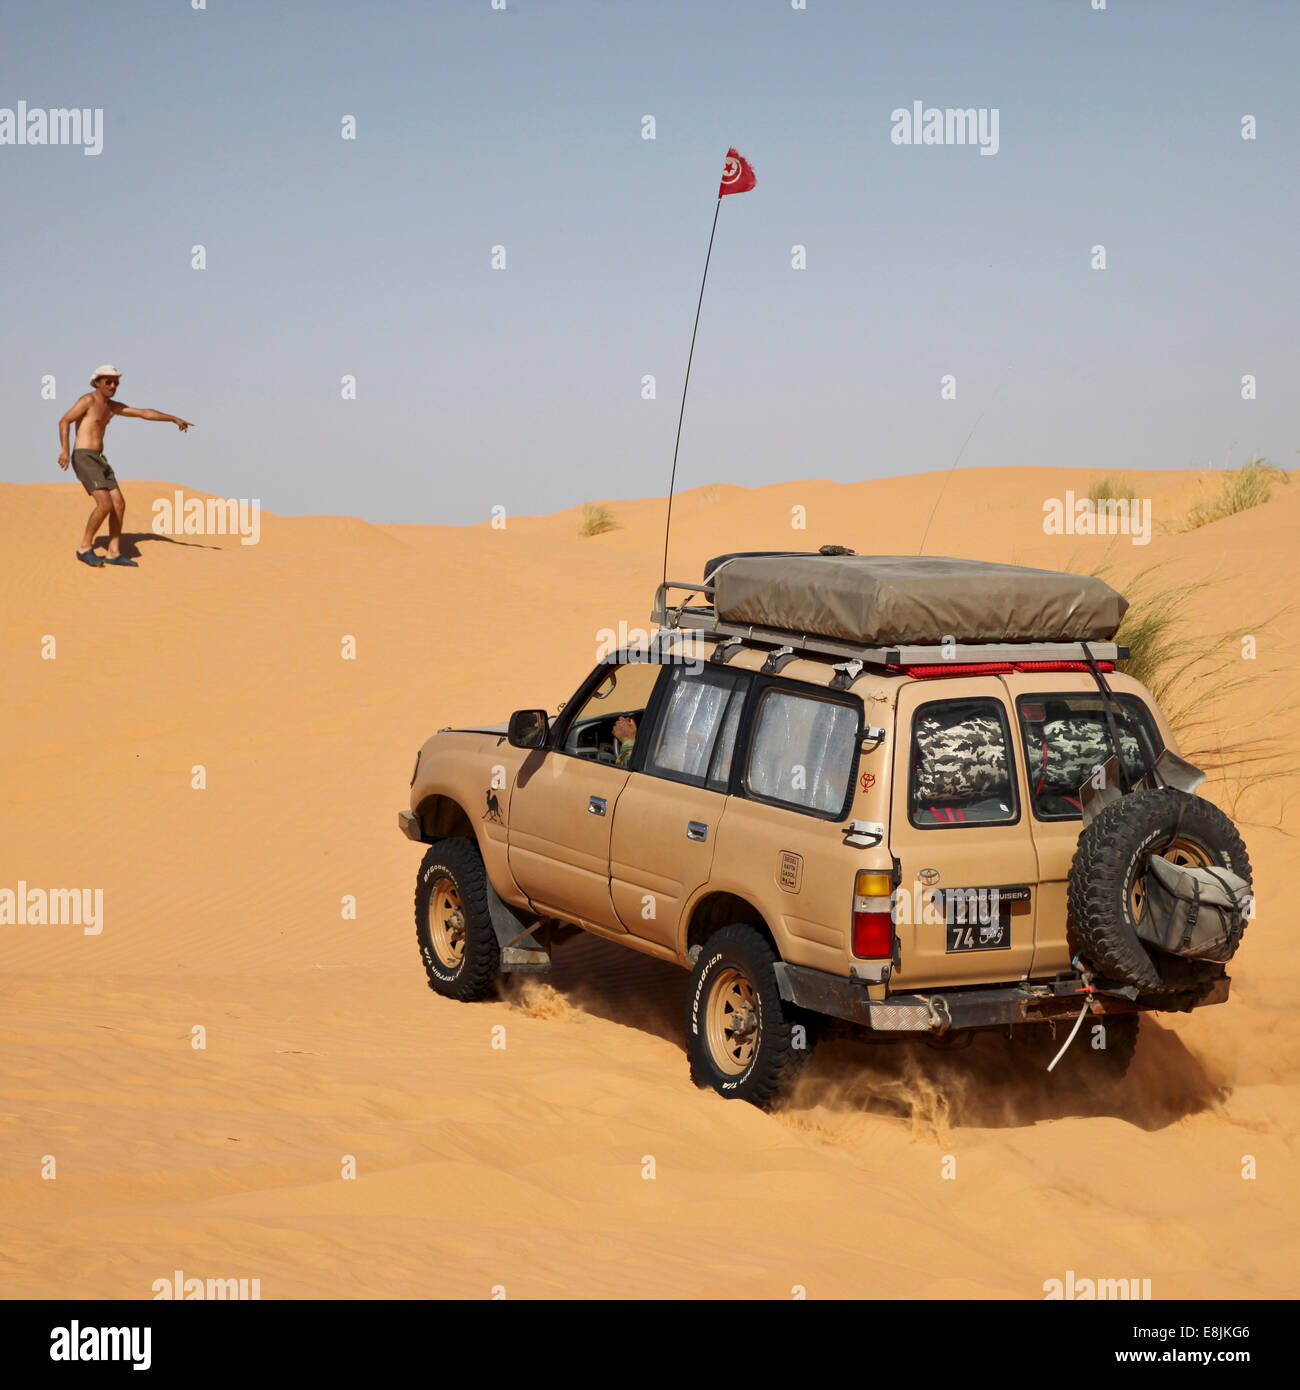 Fahrzeug in der Wüste. Stockbild